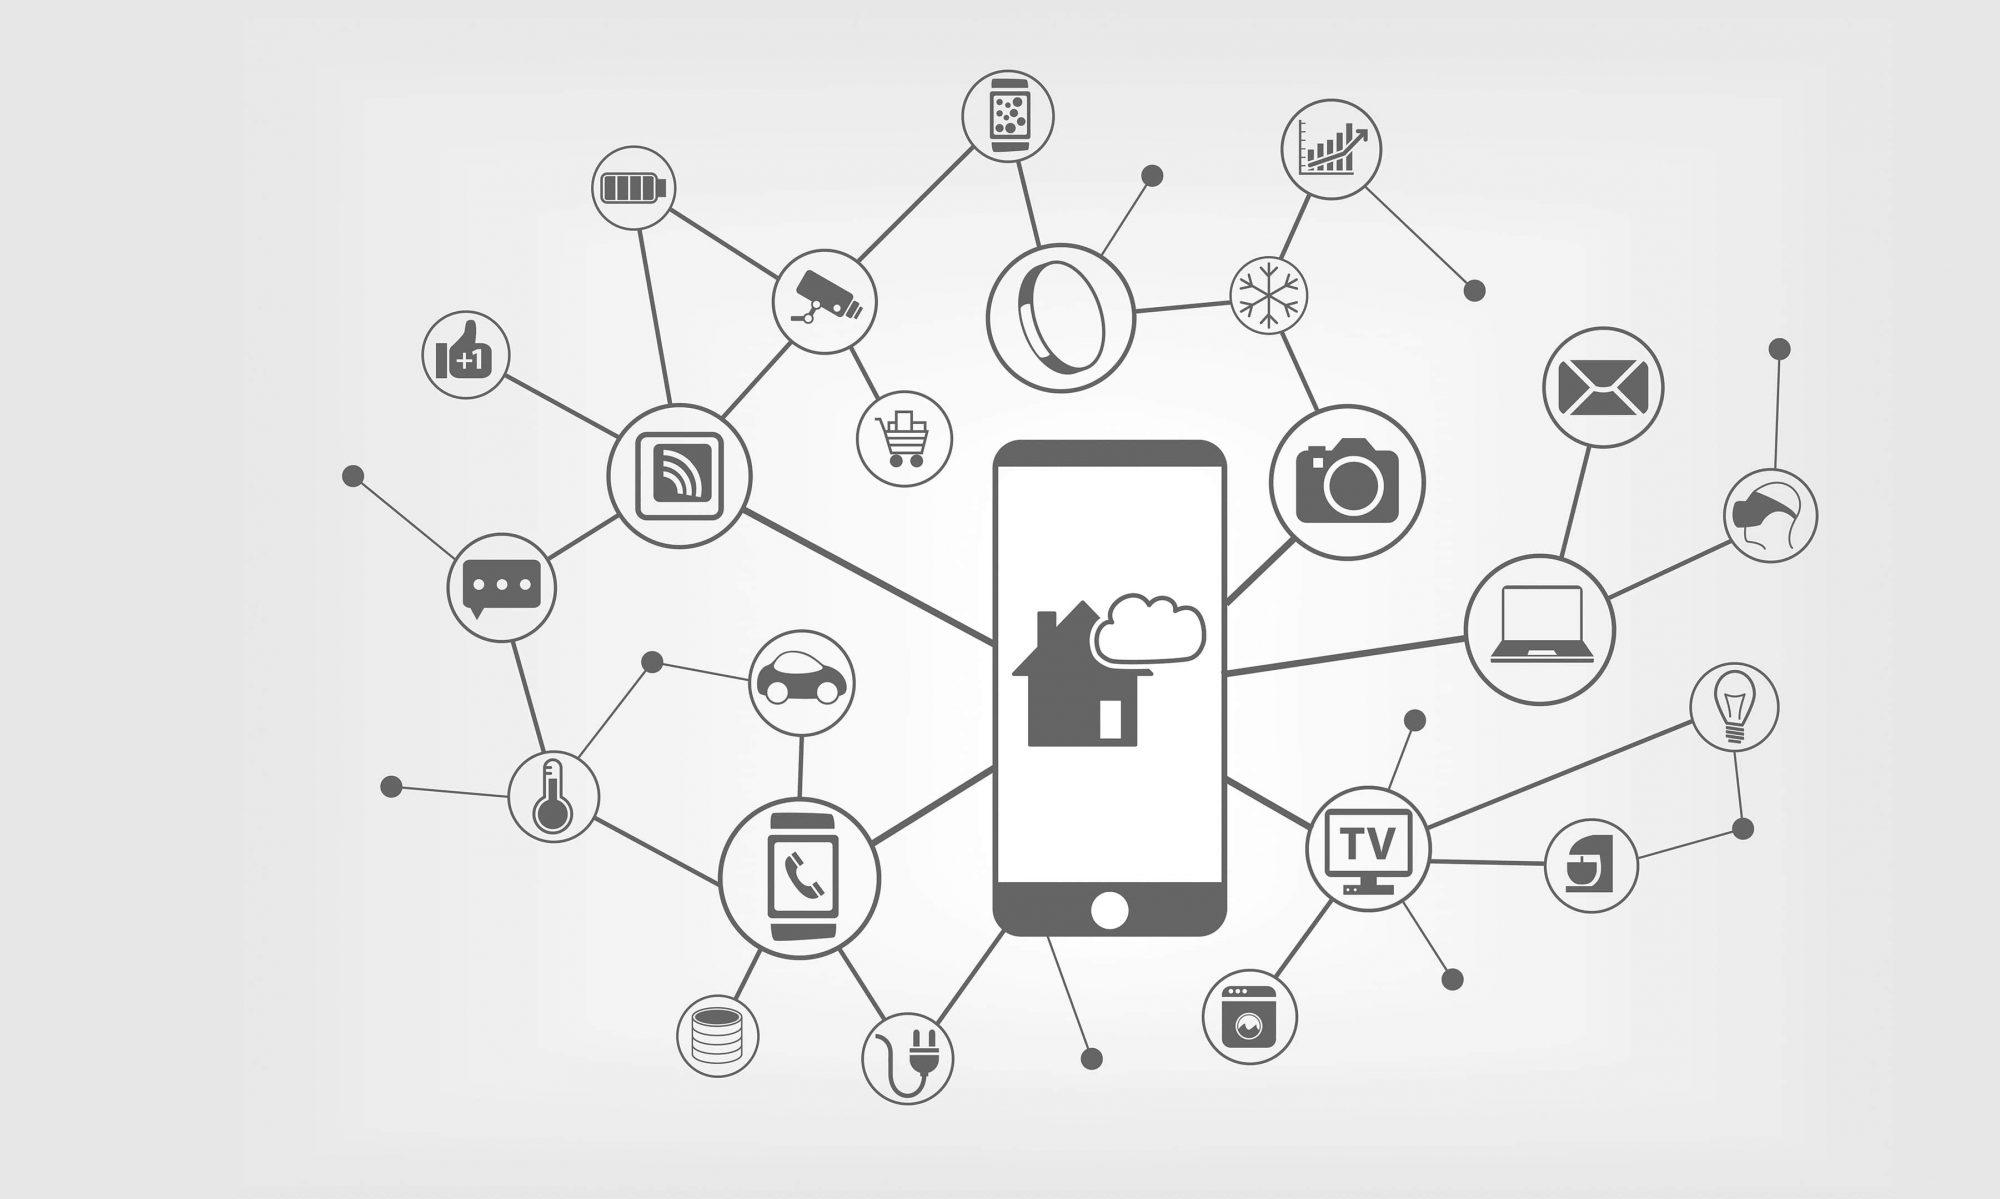 Community of Practice: Internet of Things